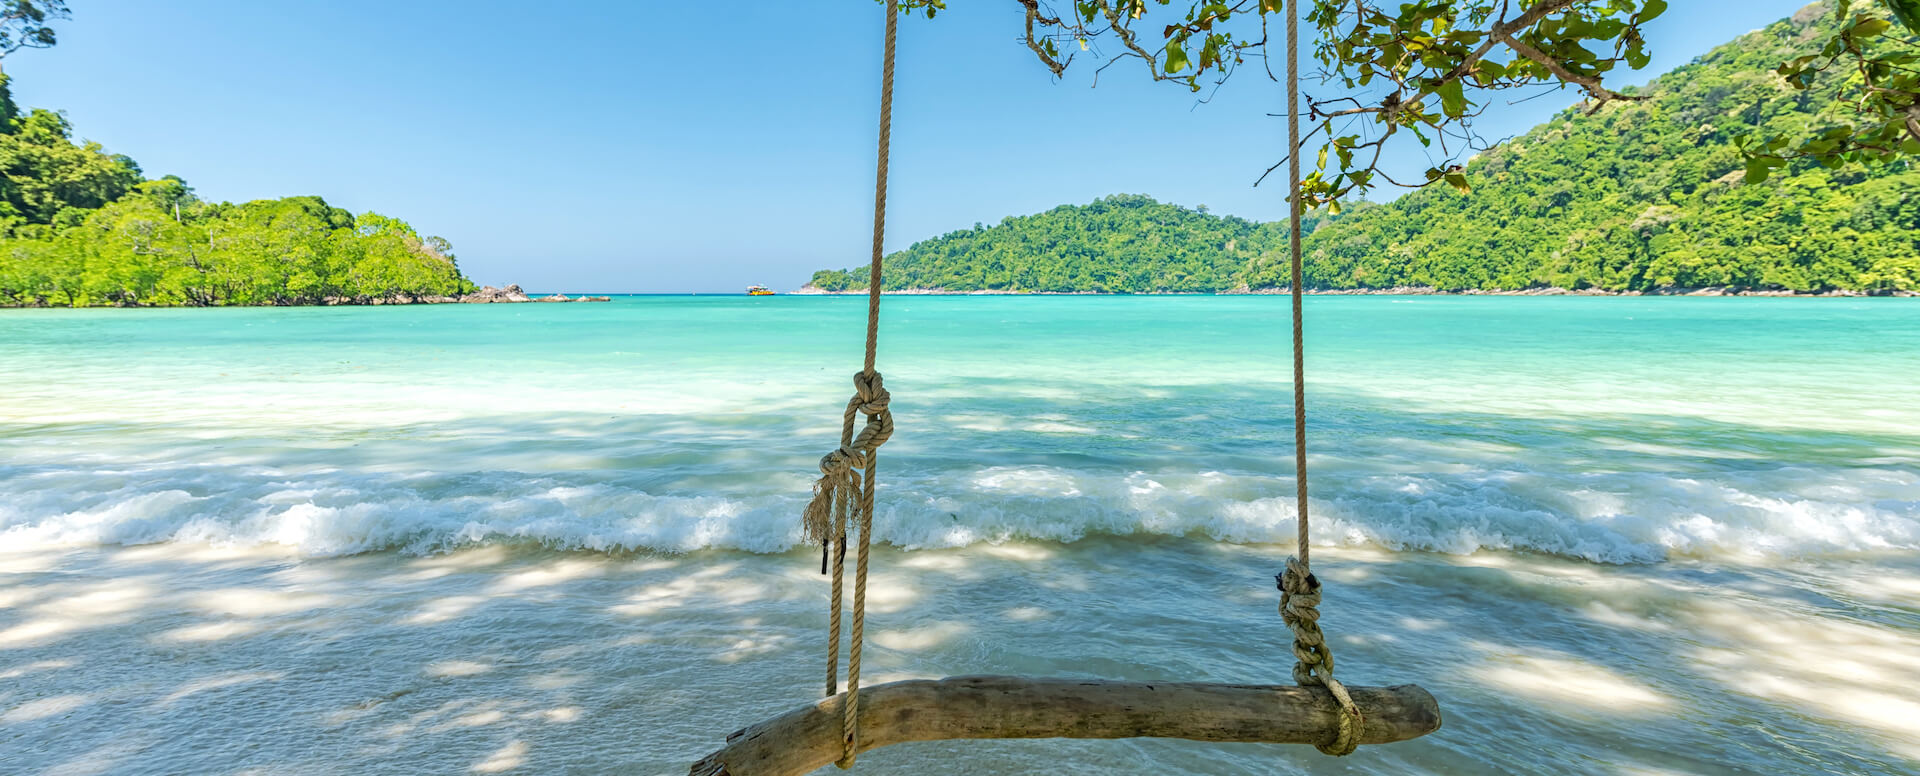 Surin Beach - Phuket - Thailand